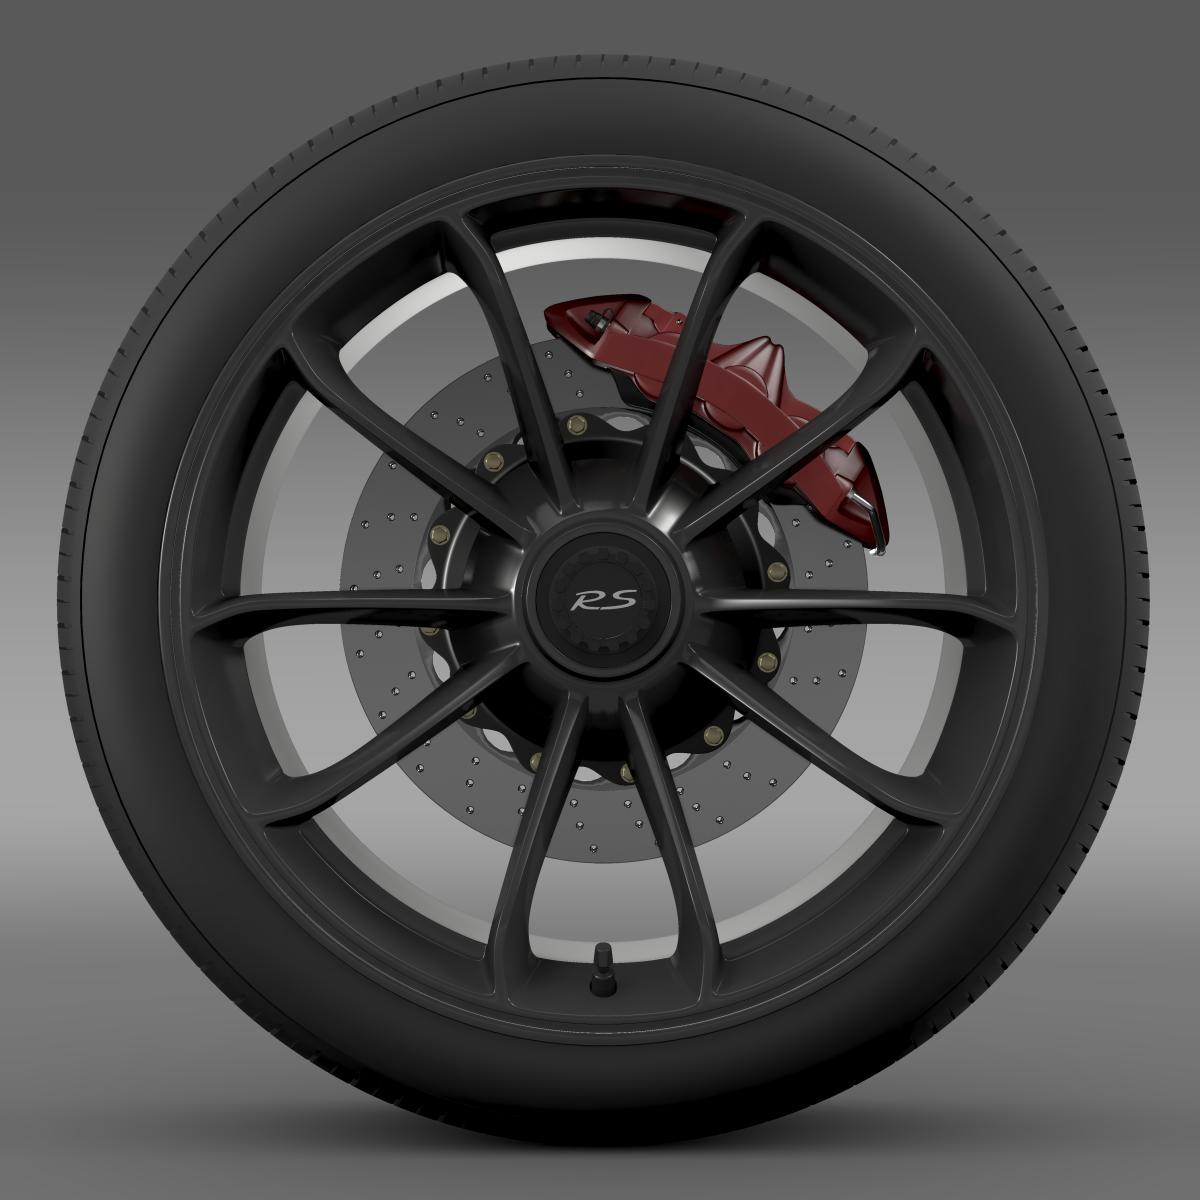 porsche 911 gt3 rs 2015 wheel 3d model 3ds max fbx c4d lwo ma mb hrc xsi obj 210829